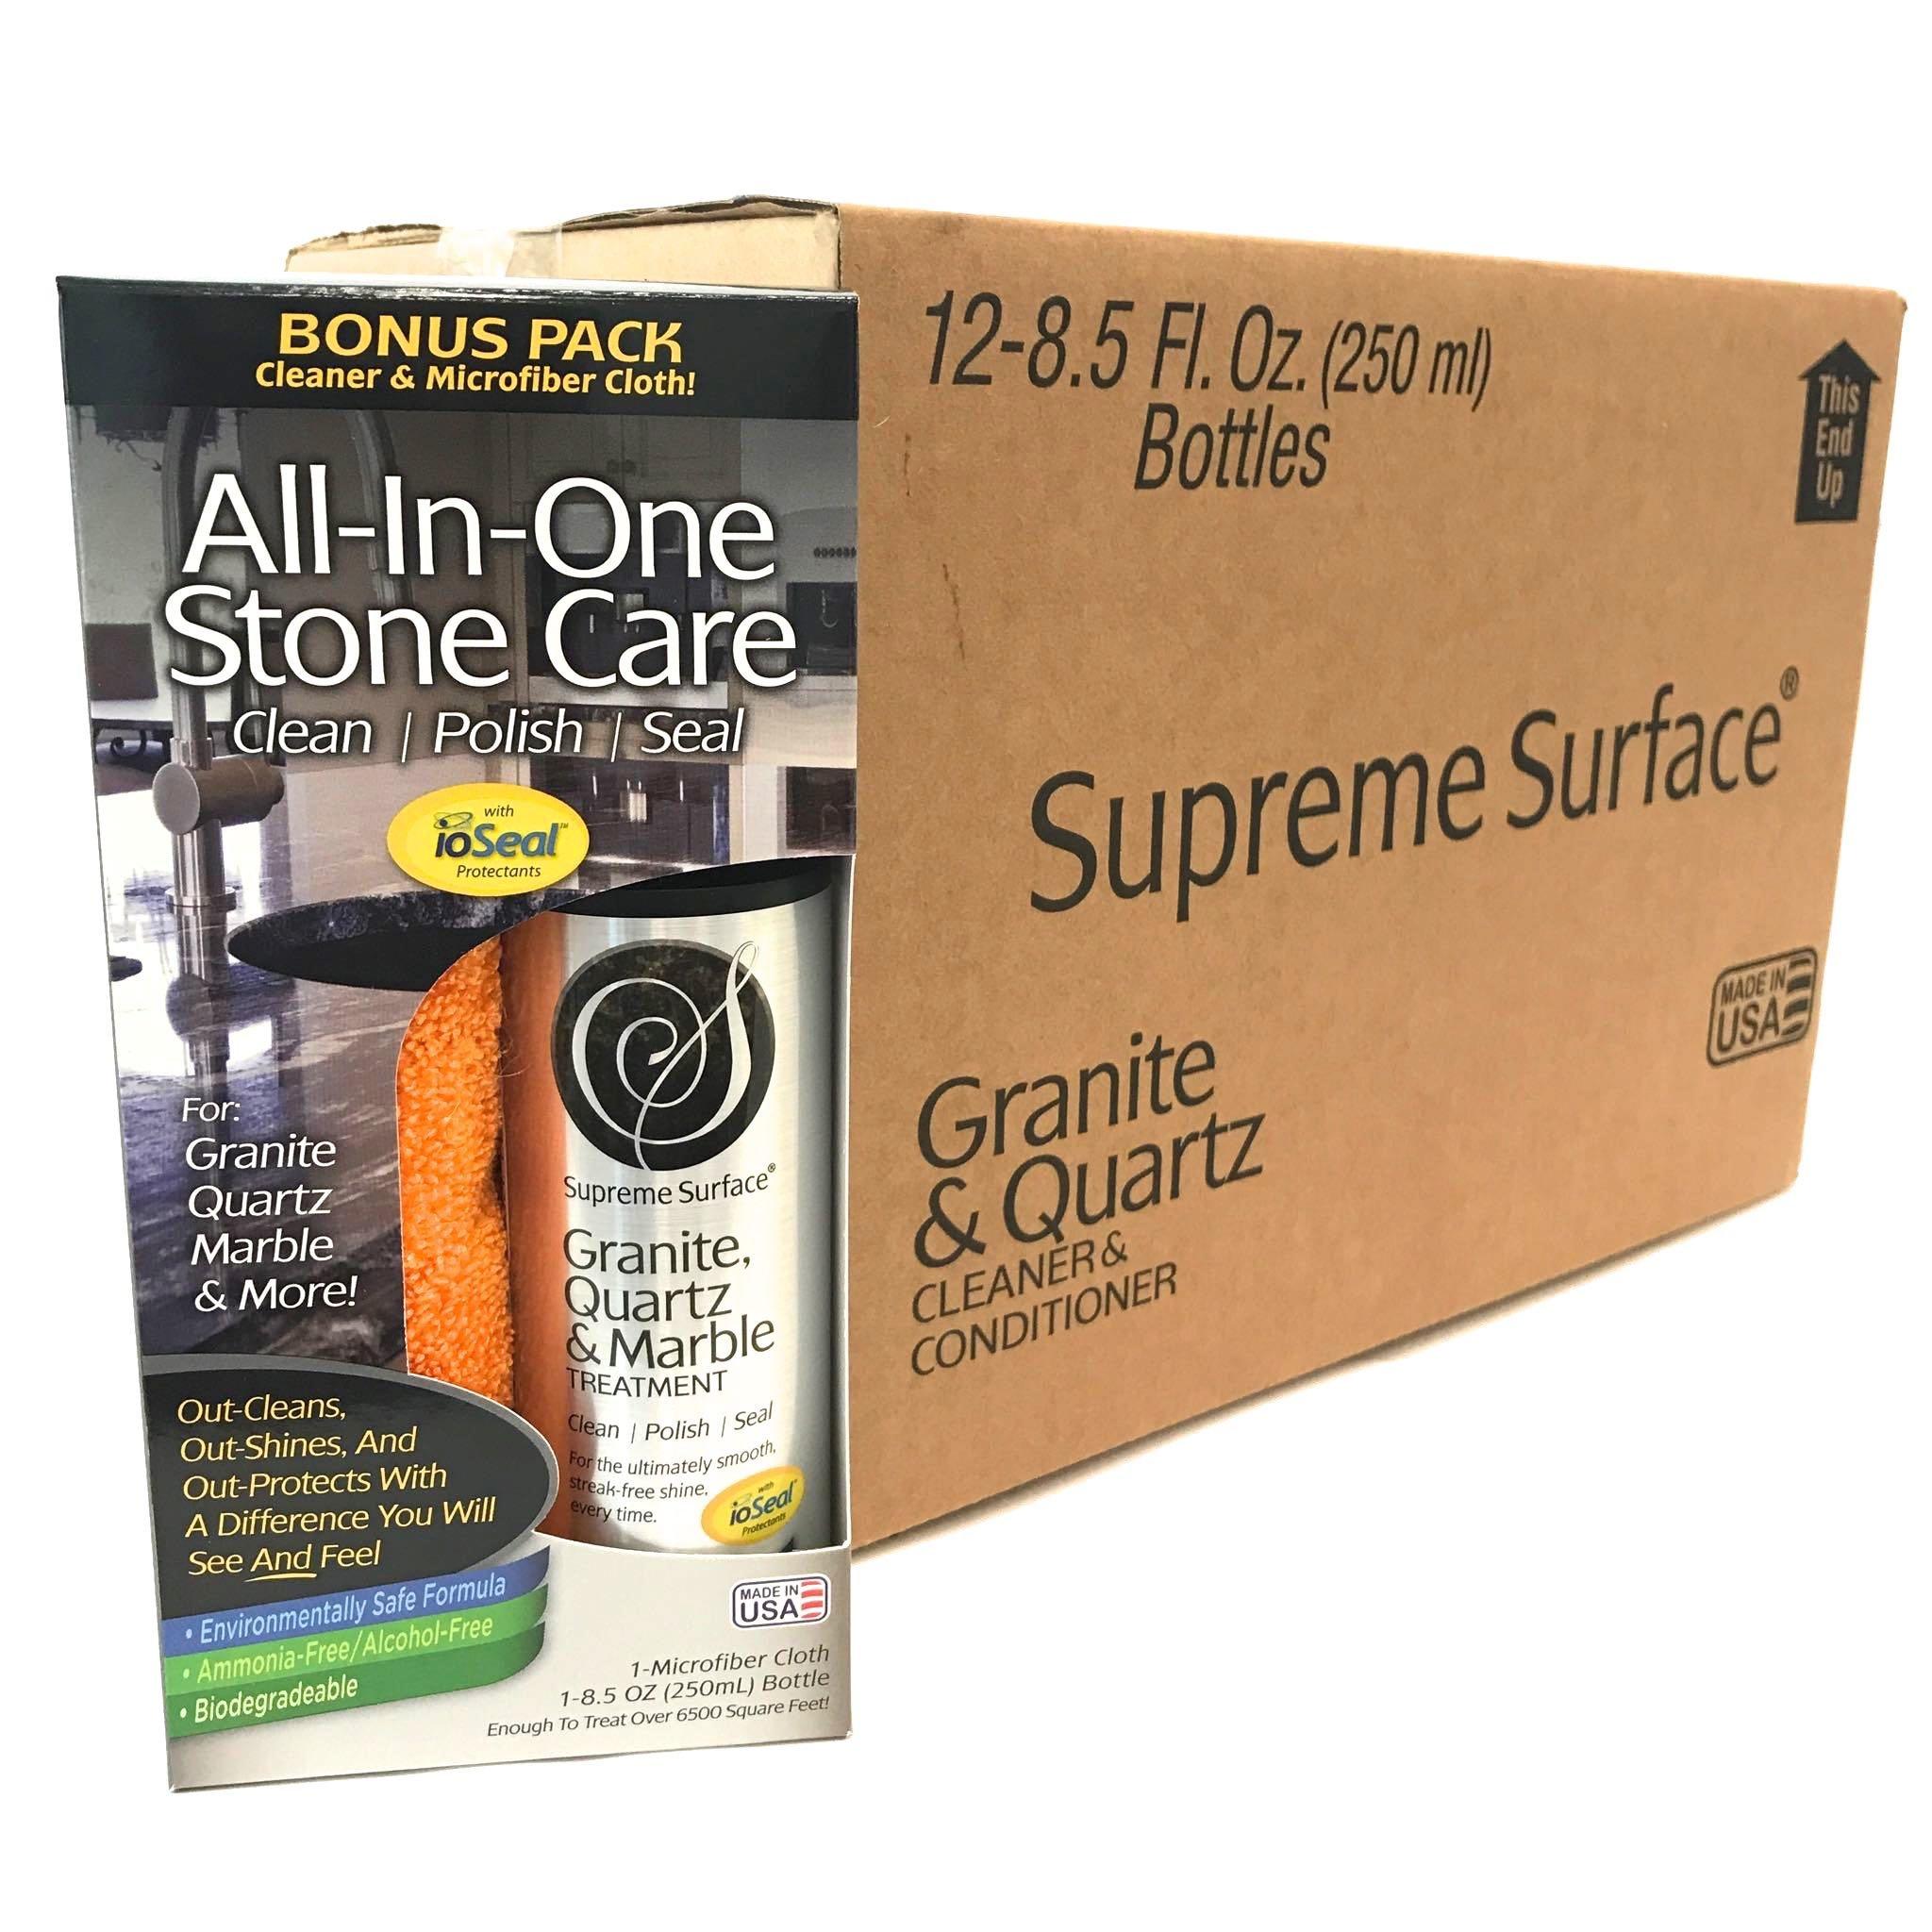 Supreme Surface Granite, Quartz & Marble Treatment (8.5 fl oz Bonus Pack Case (12 units))